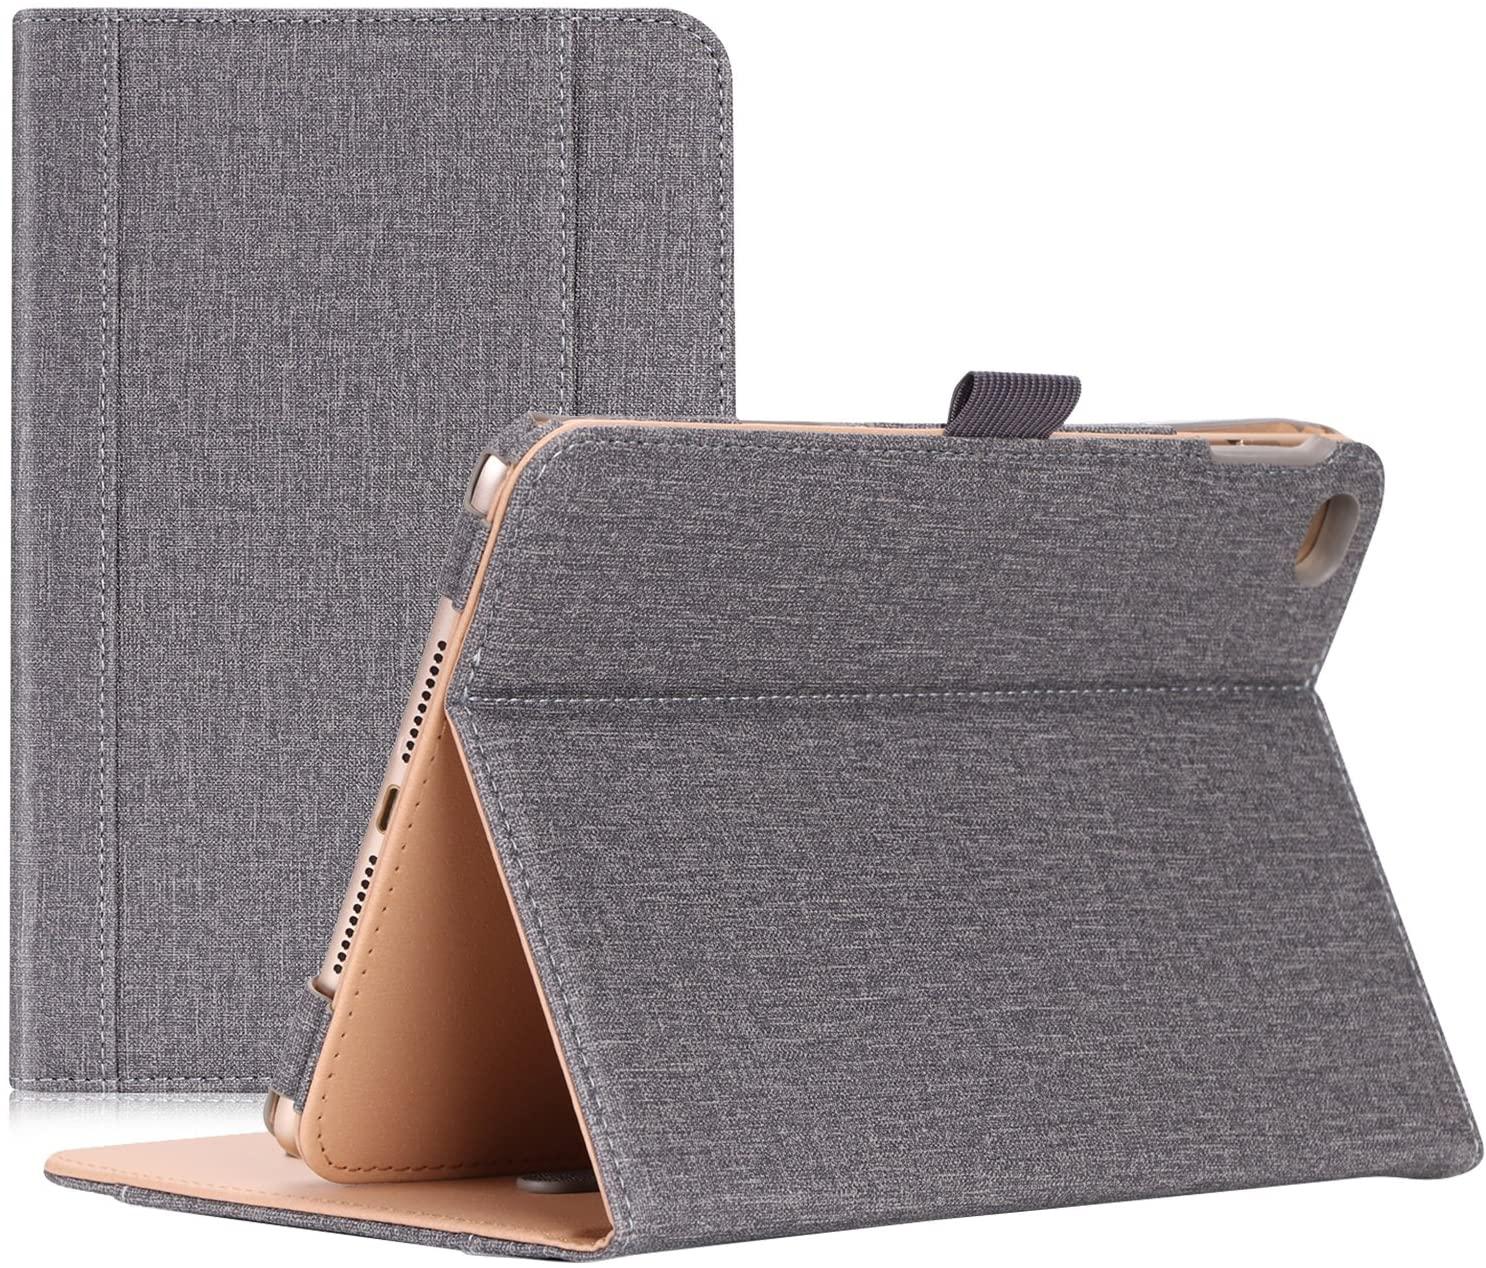 Procase iPad Mini 4 Case - Leather Stand Folio Case Cover for 2015 Apple iPad Mini 4 (4th Generation iPad Mini, mini4), with Multiple Viewing Angles, auto Sleep/Wake, Document Card Pocket (Grey)